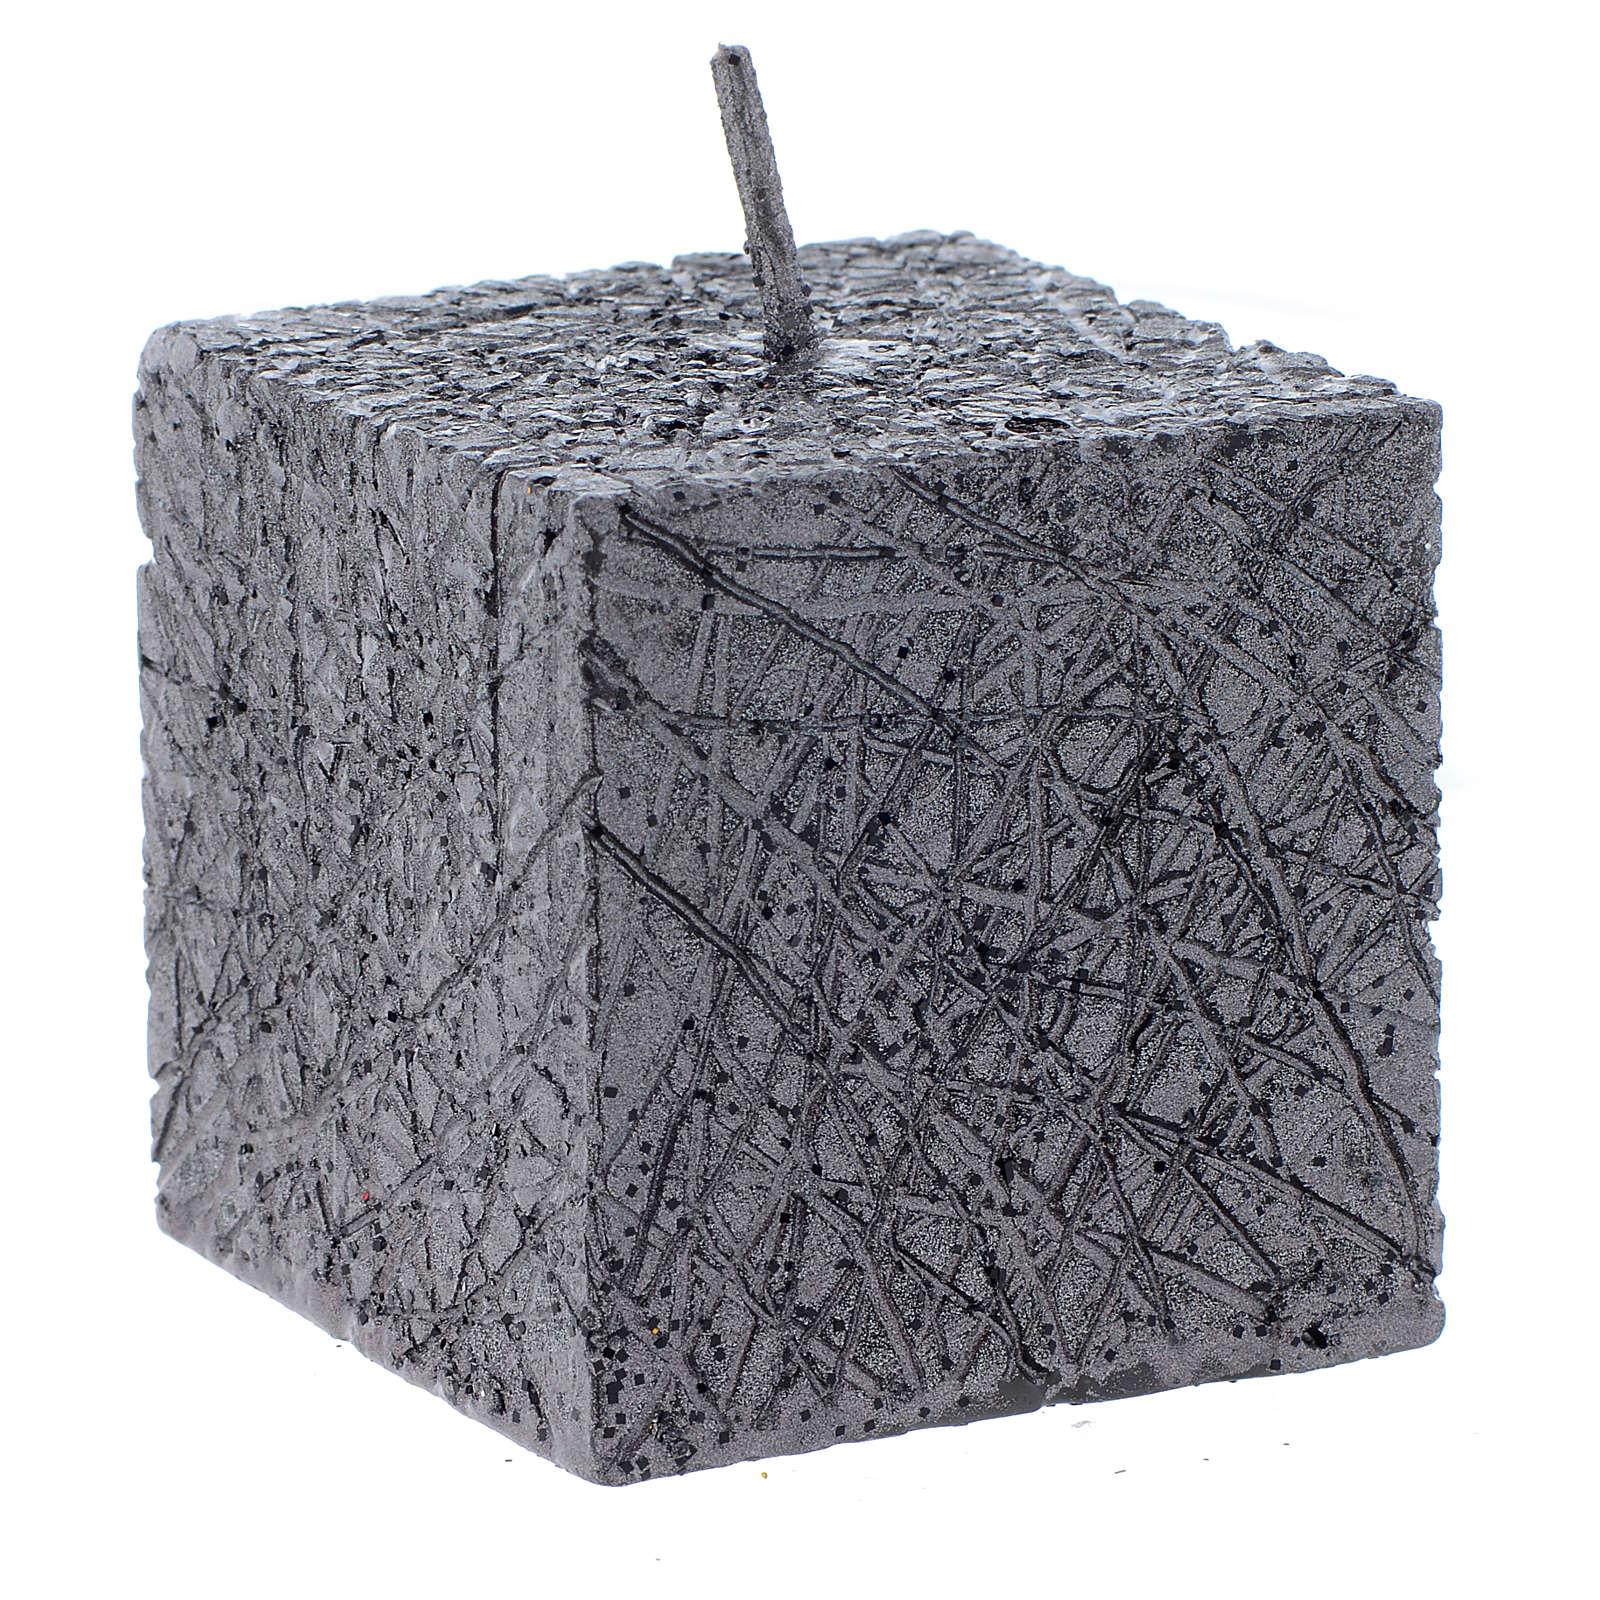 Christmas candle, comet model, cubic shaped charcoal grey colour 5x5cm 3